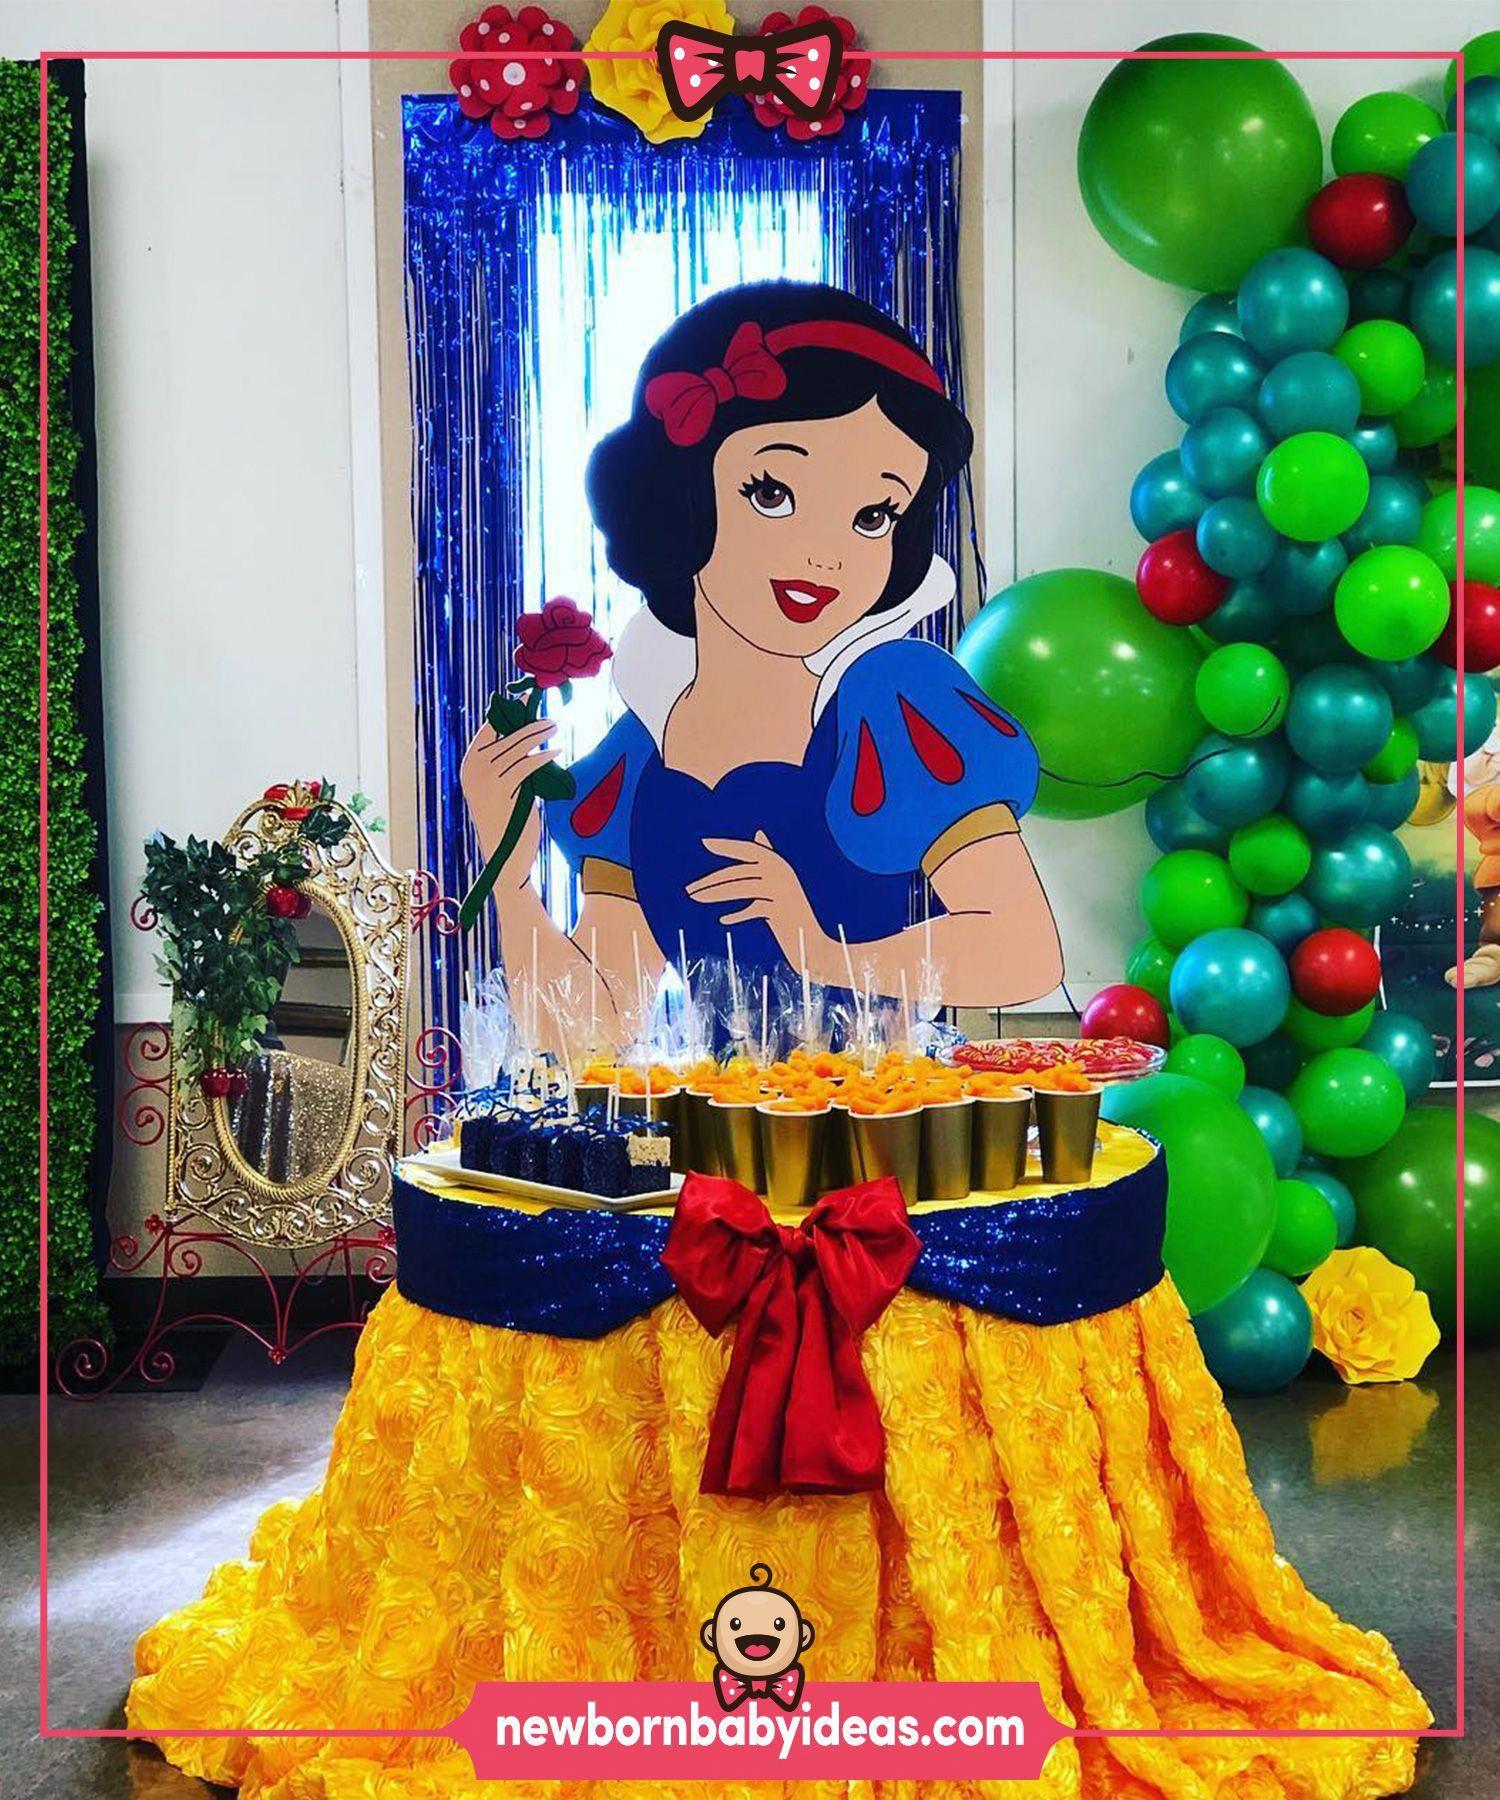 Lavish Princess Birthday Decorations Best Online Resources Birthdayparty Snow White Birthday Party Snow White Birthday Cinderella Birthday Party Decorations